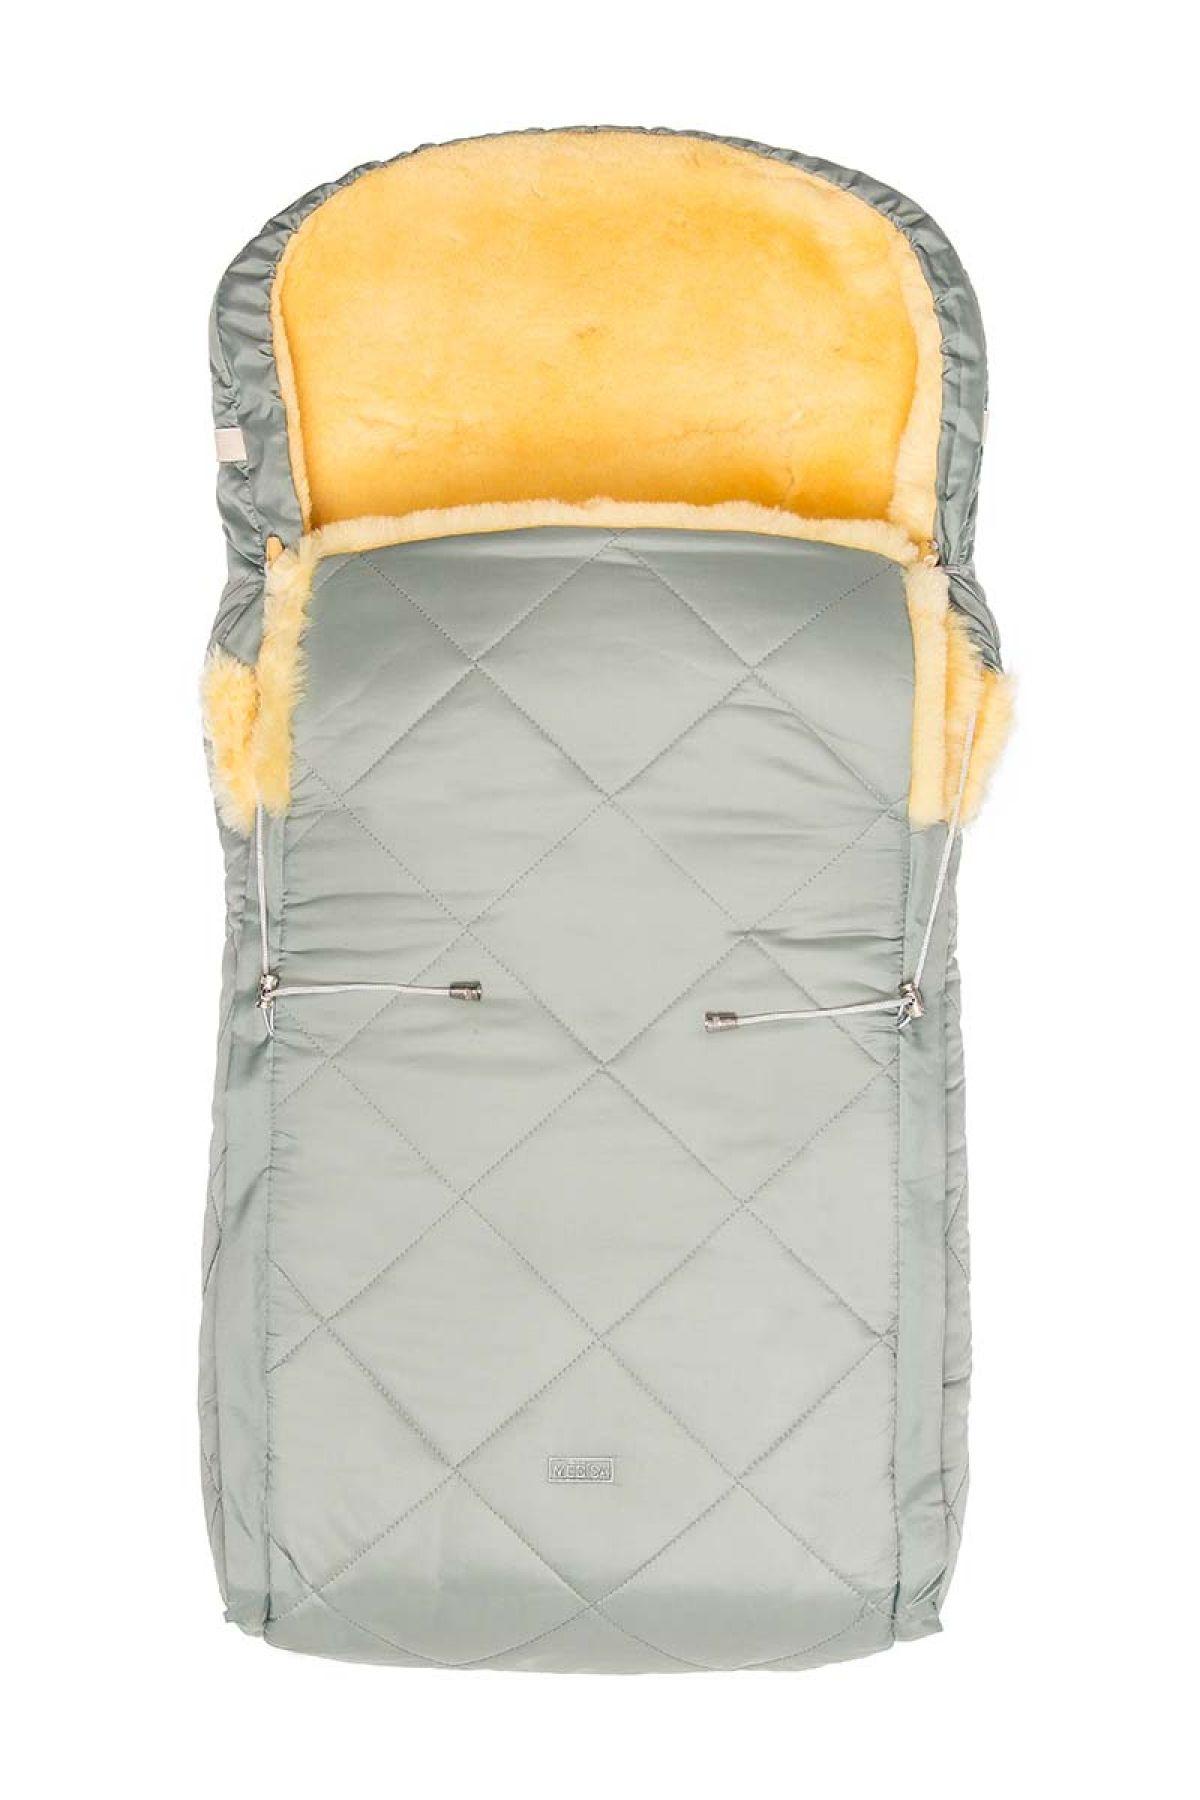 Sheepy Care Double Zippered Baby Sleeping Bag MDK012 Green